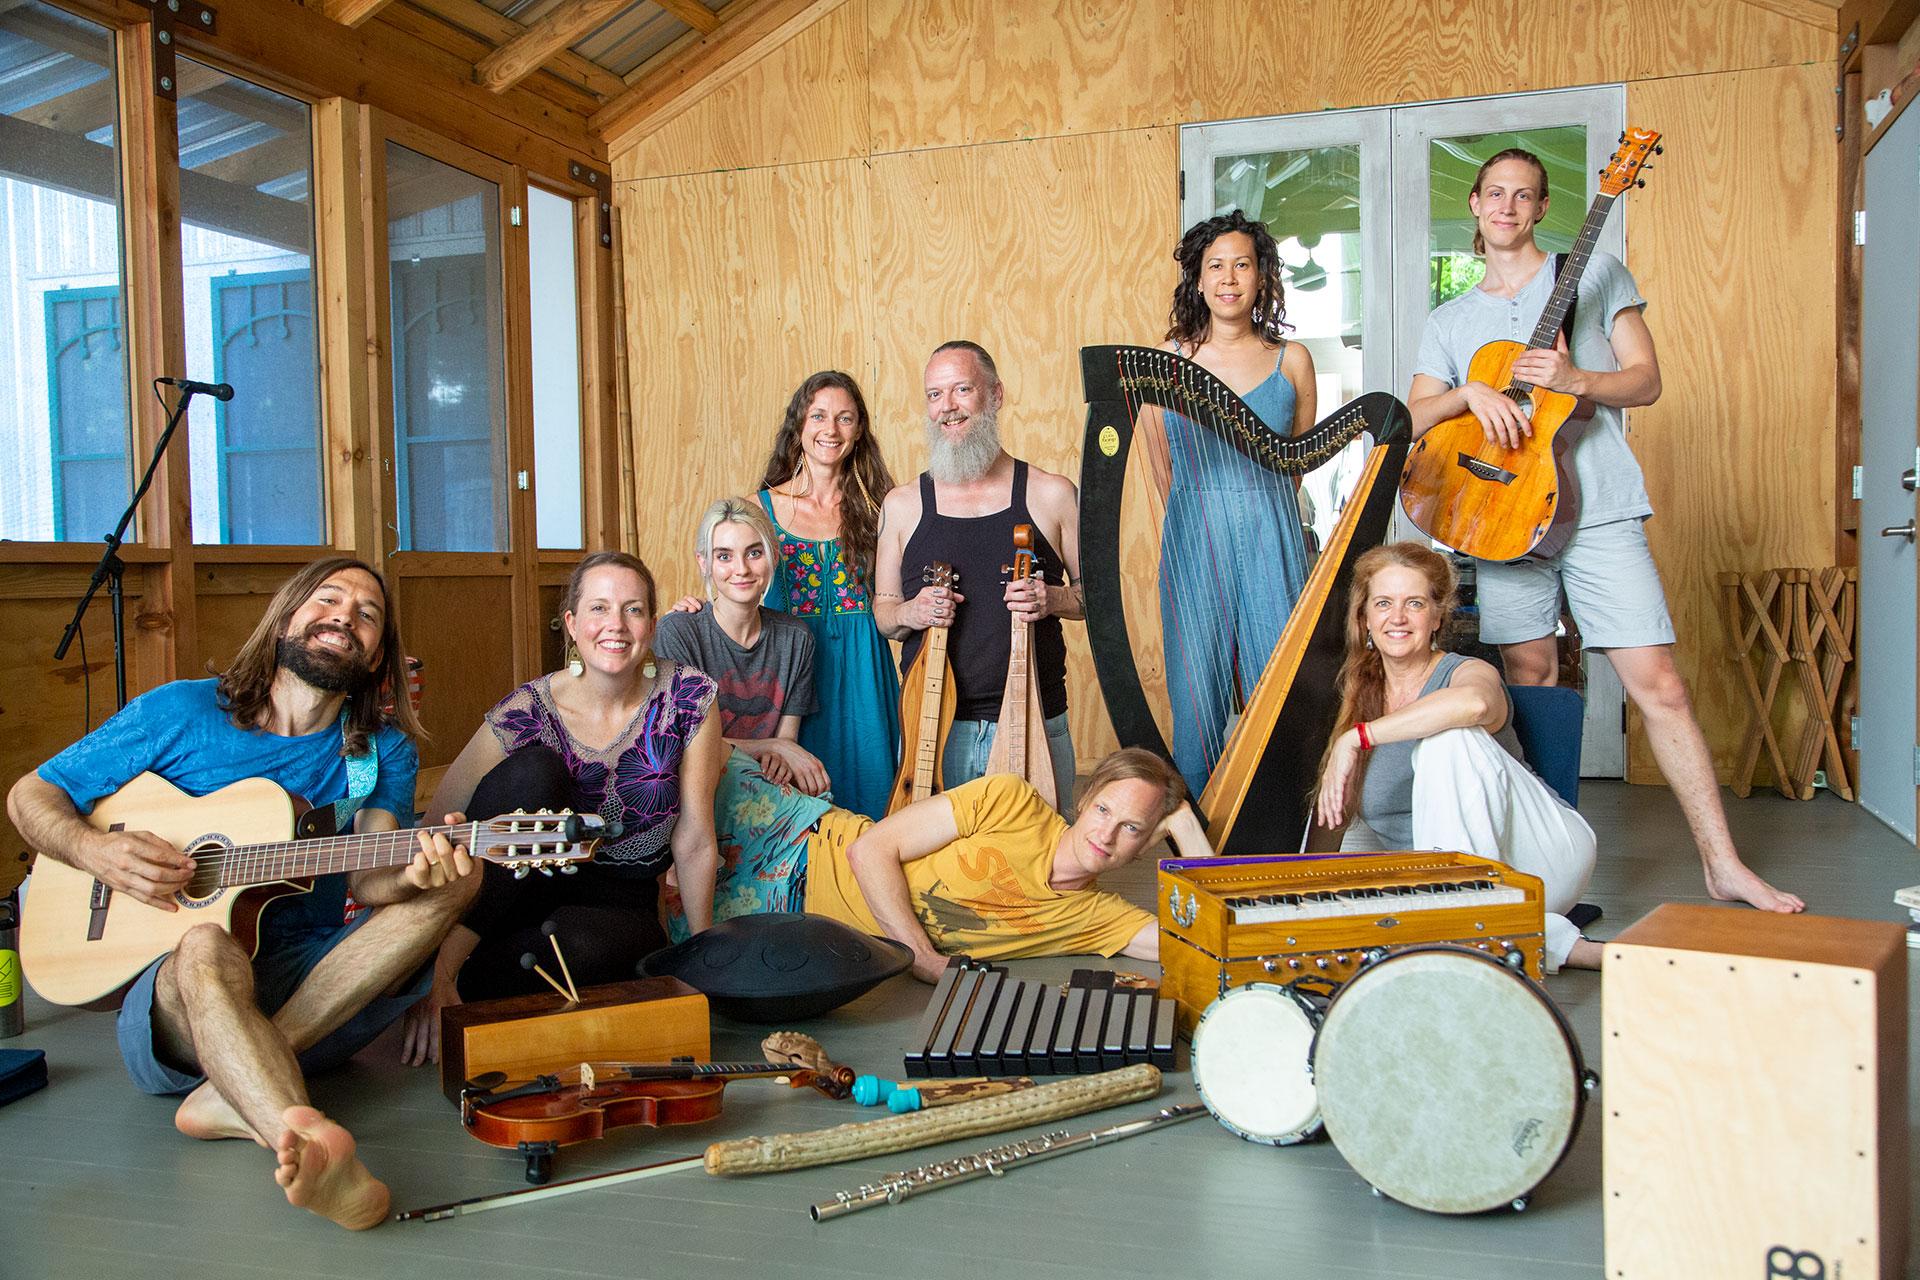 Milli-Moonstone-Music-Workshop-Austin-2019-40.jpg